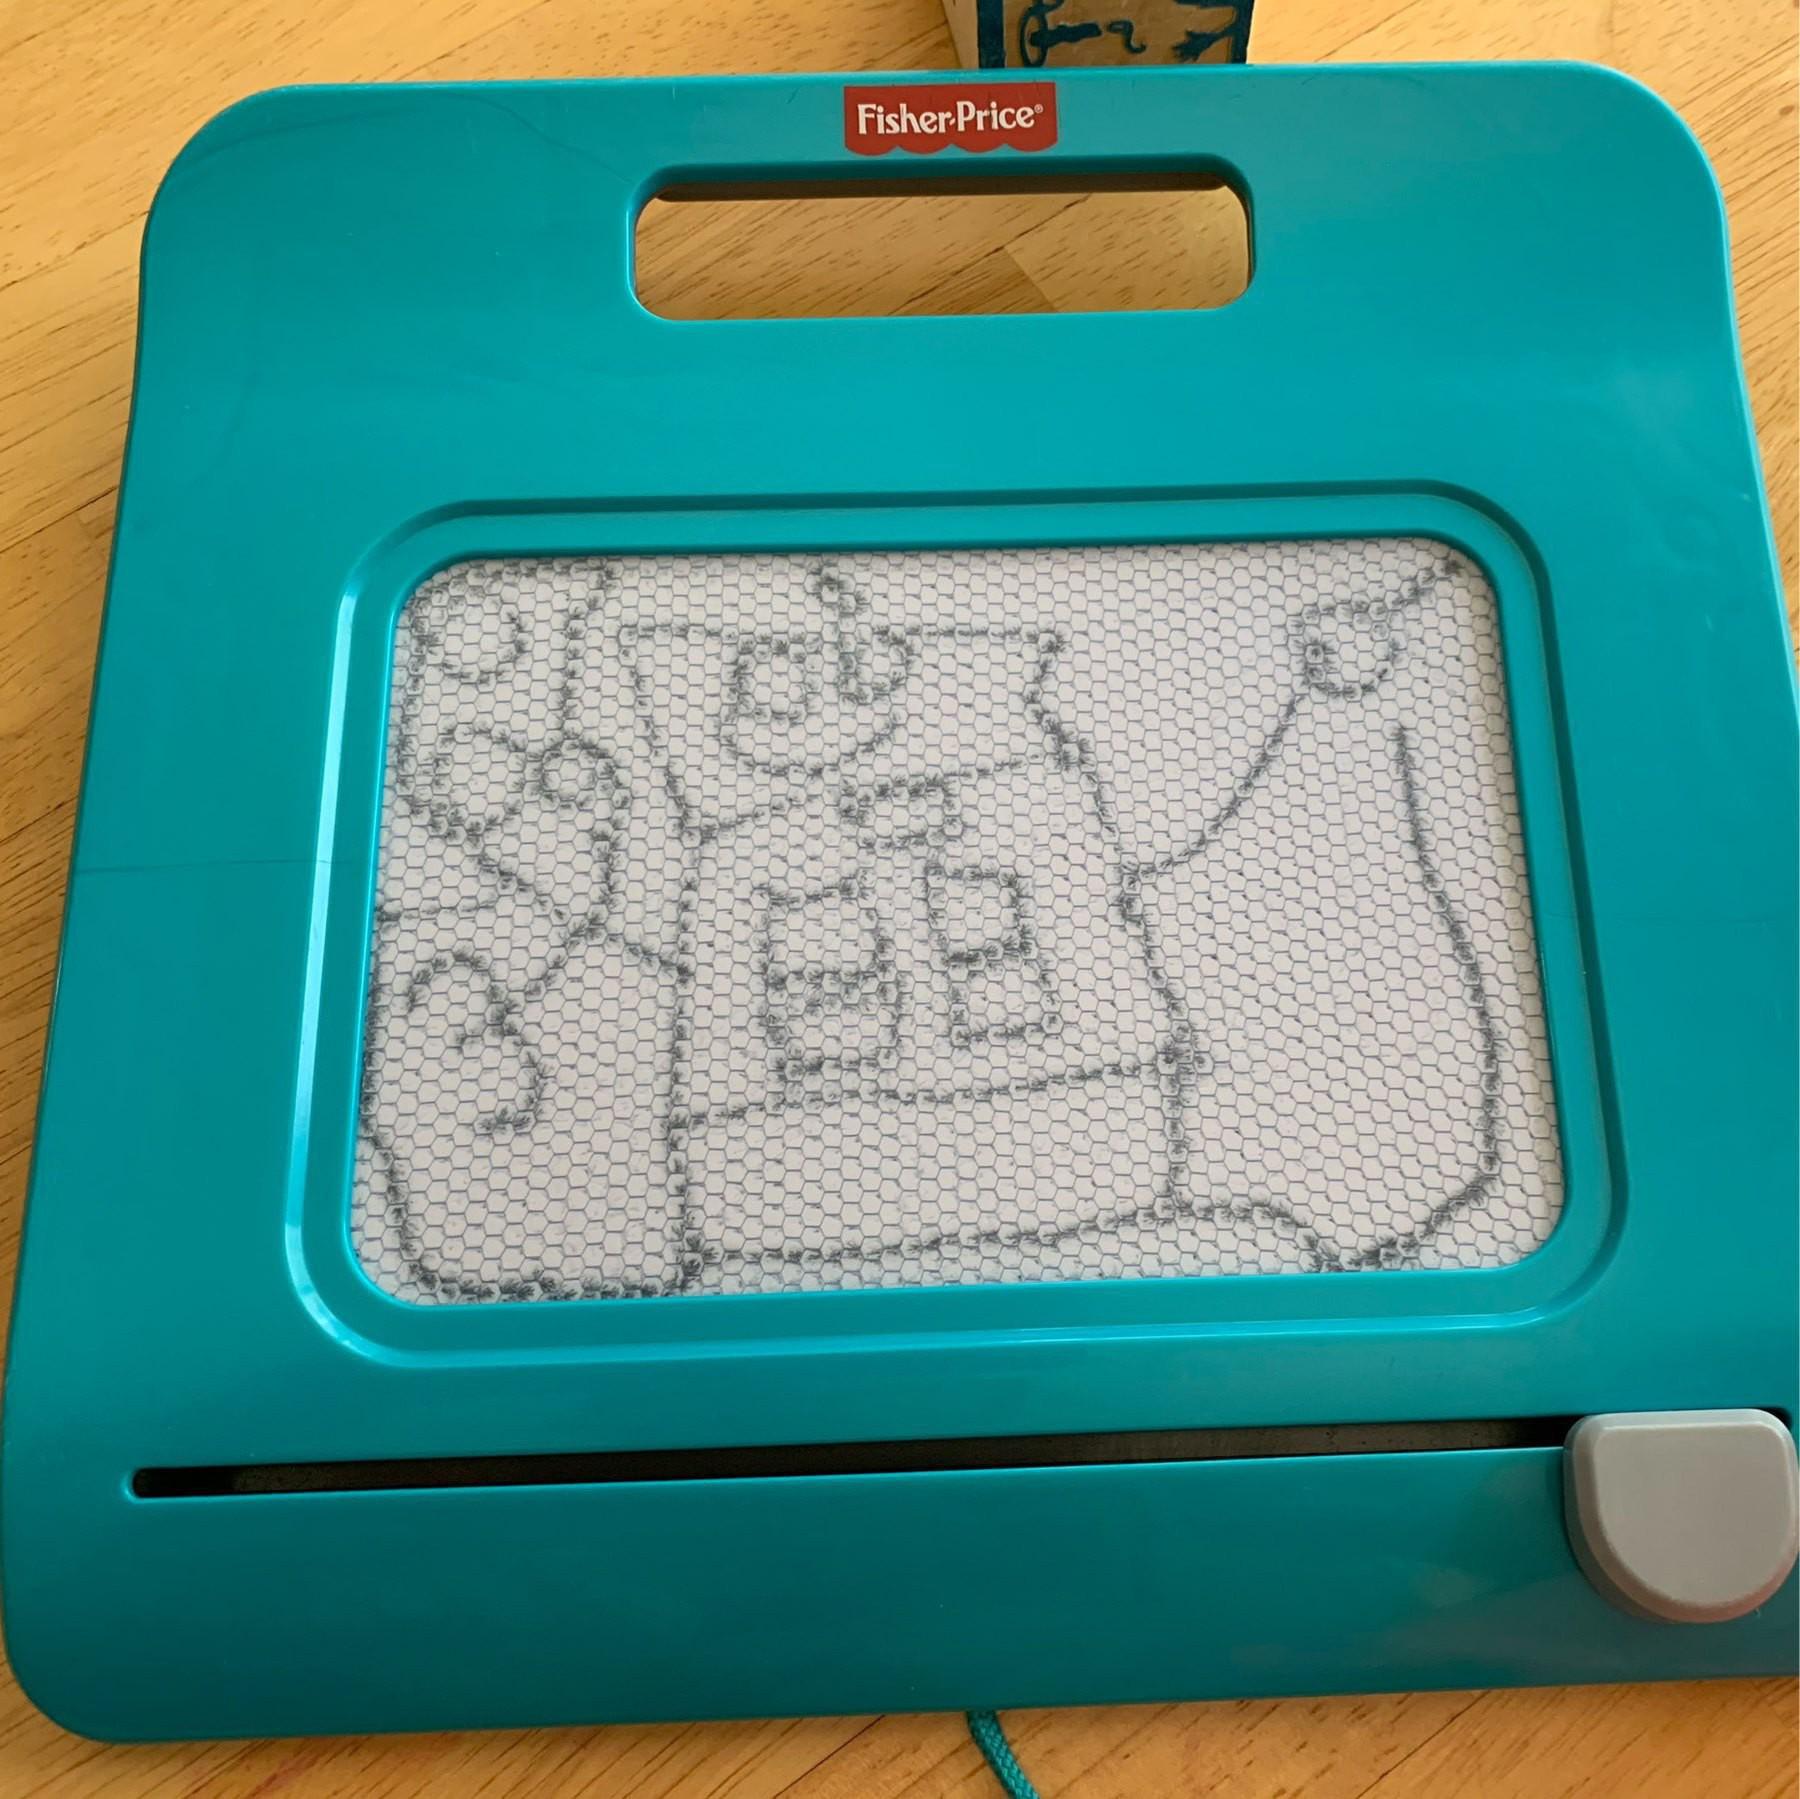 Robot drawn on magna-doodle